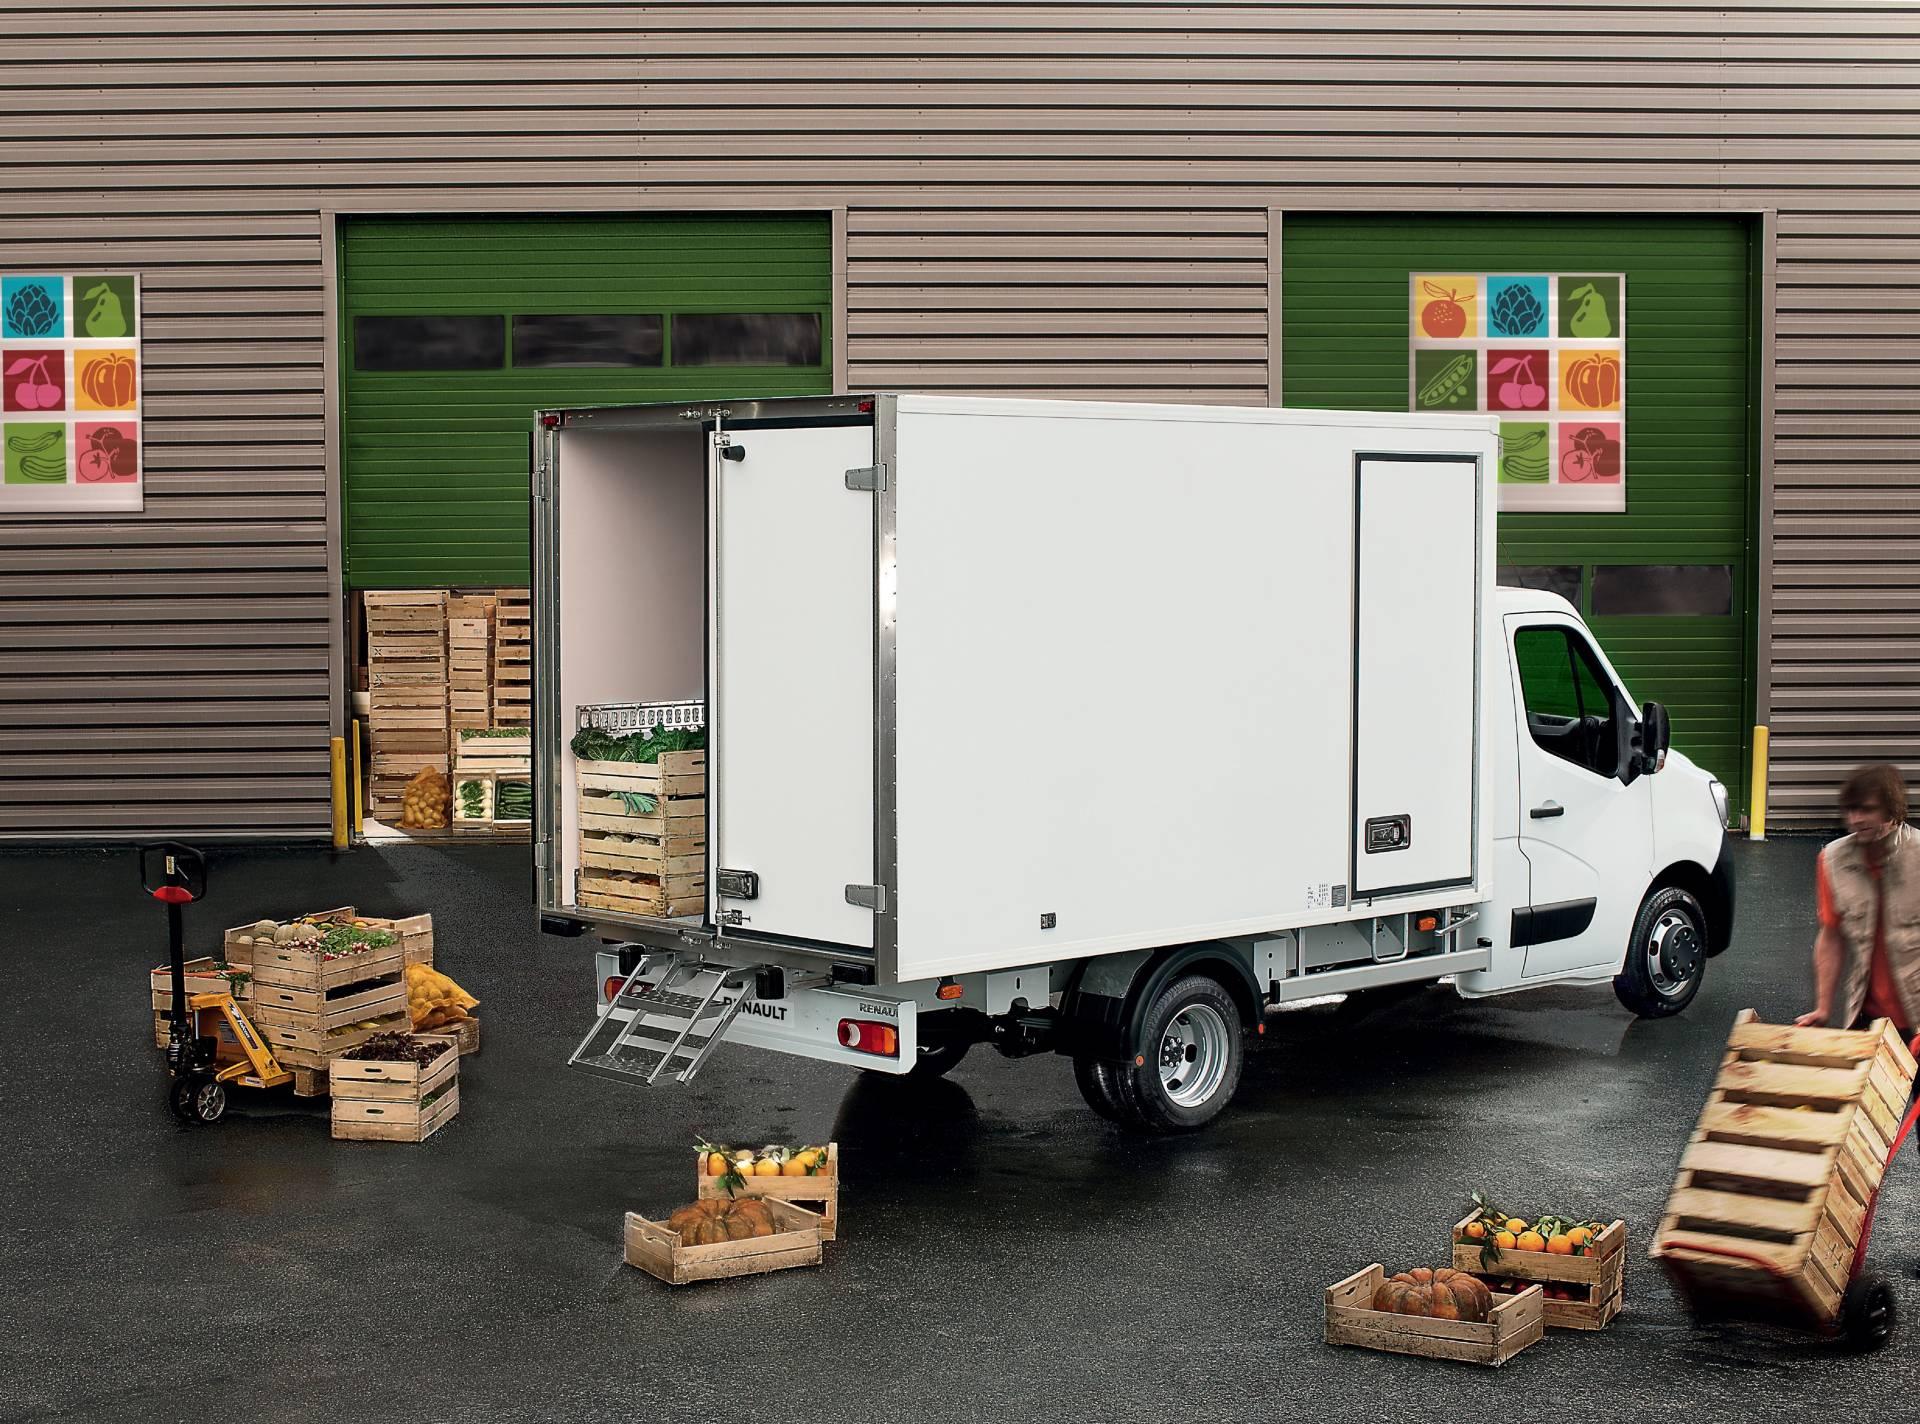 cf7c626e-2019my-renault-master-van-facelift-10